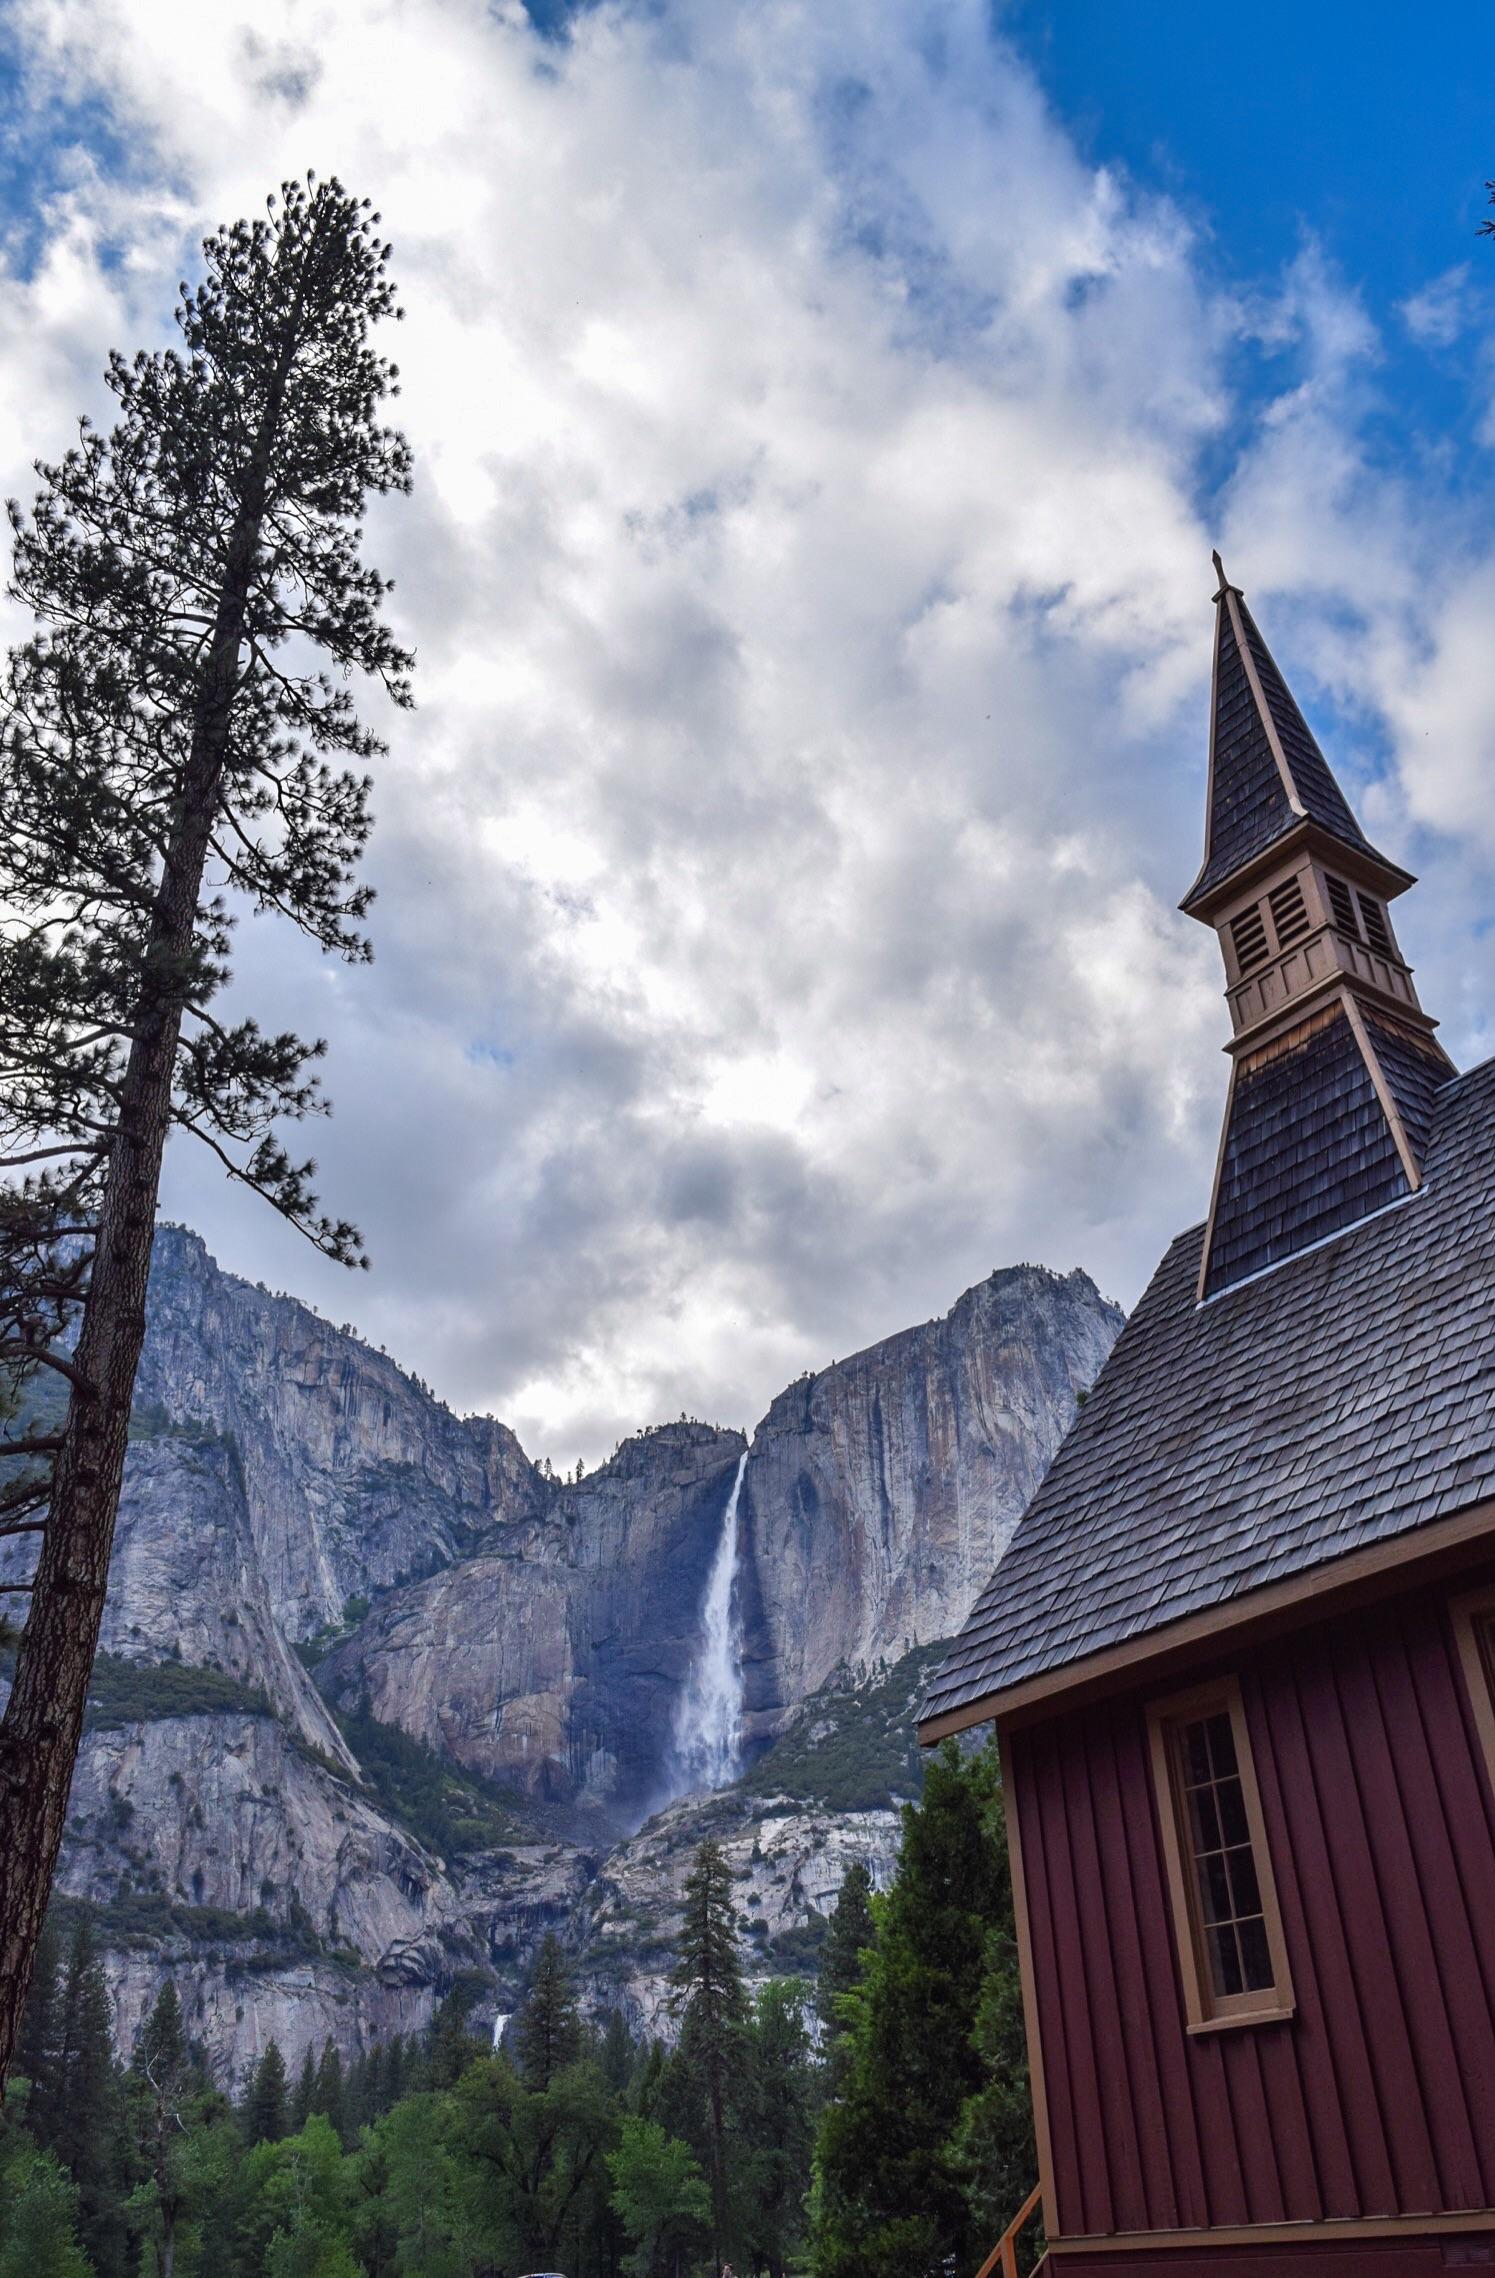 Yosemite - Upper and Lower Falls